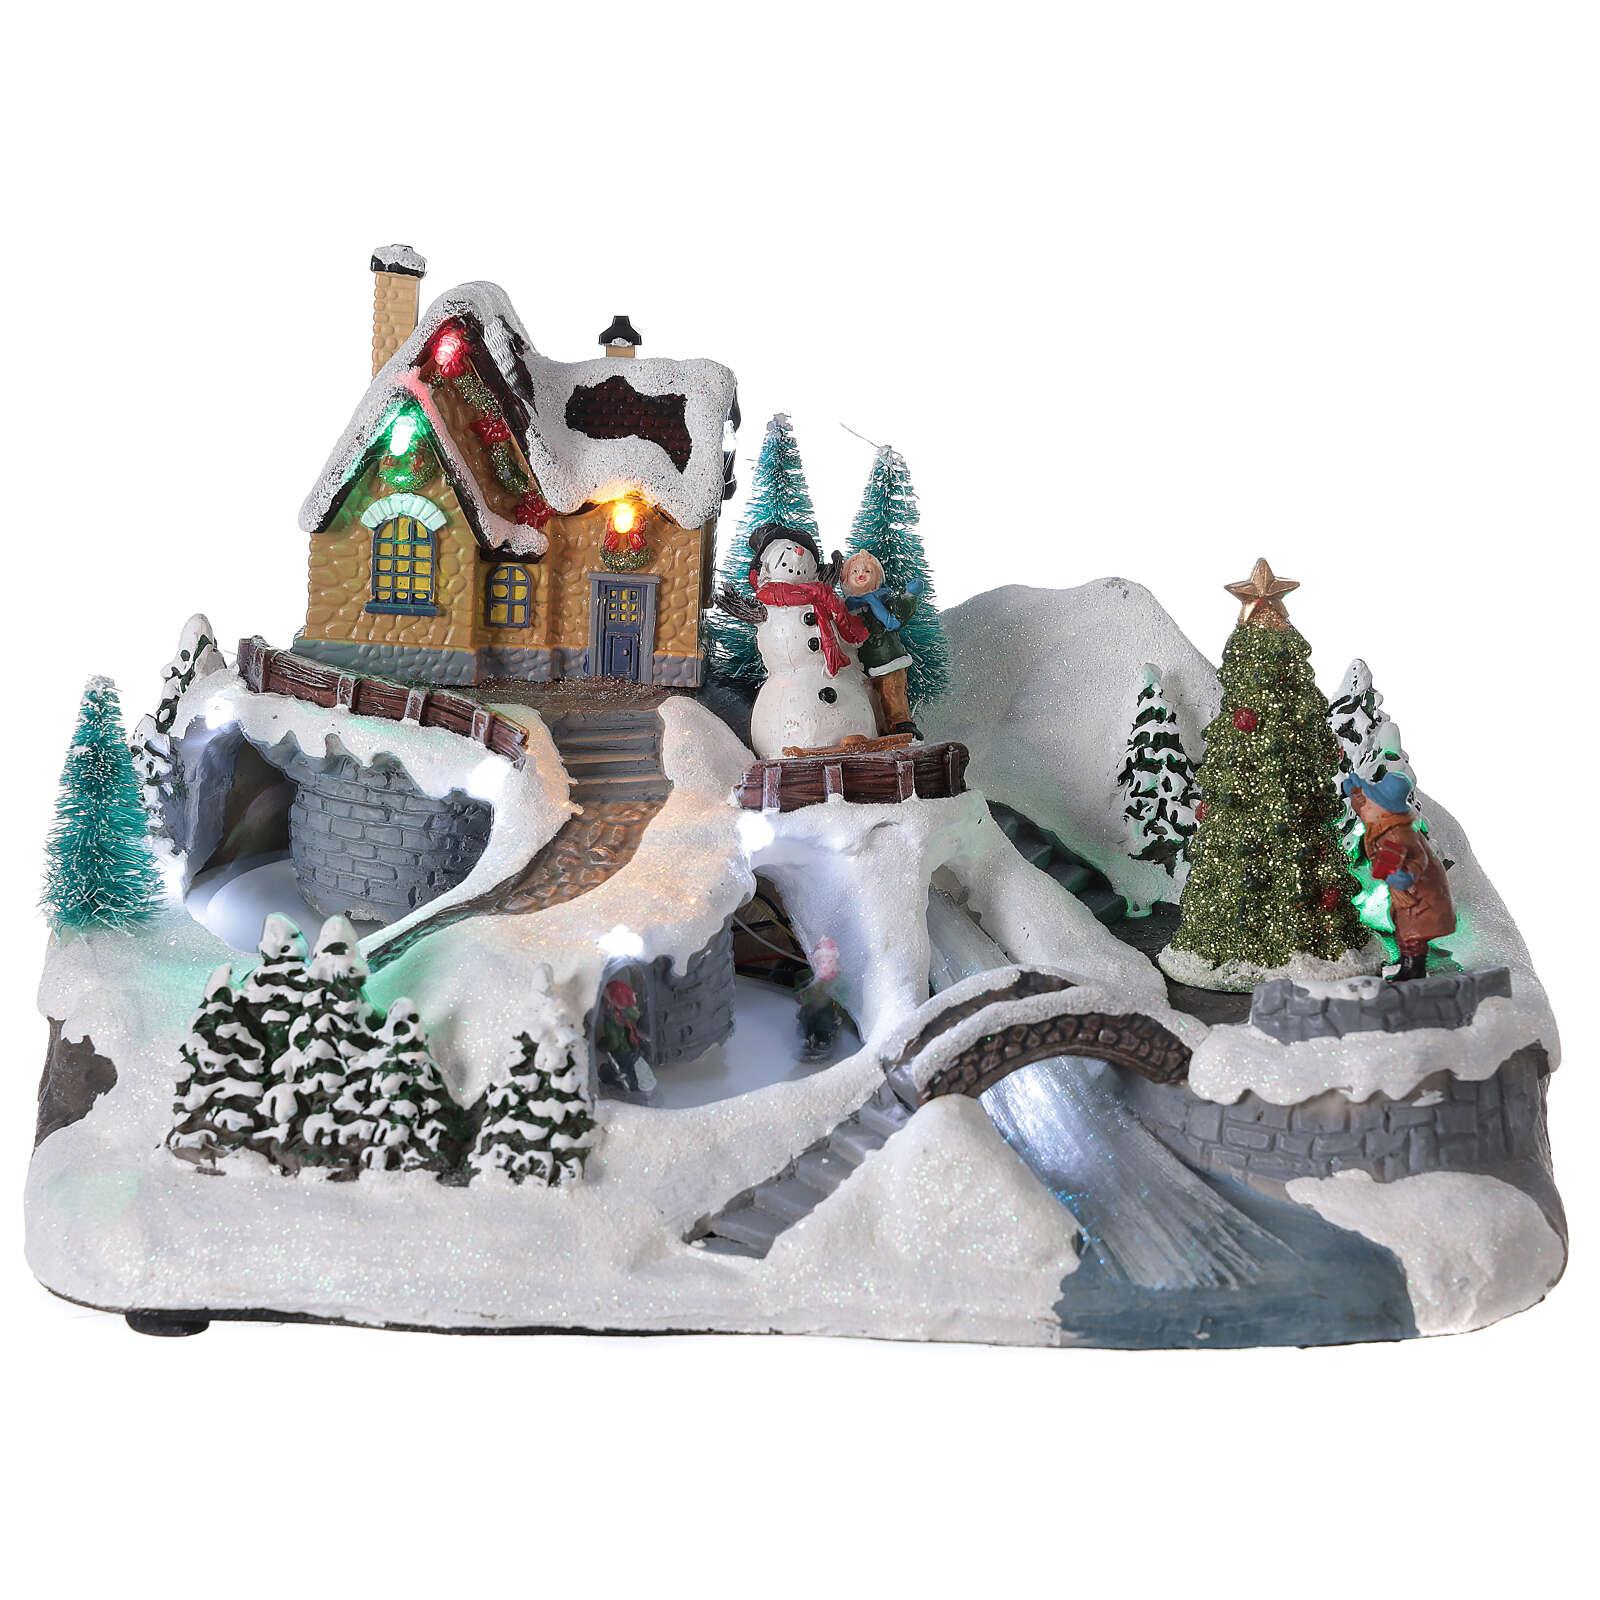 Lighted Christmas village tree skaters river lights 20x30x20 cm 3